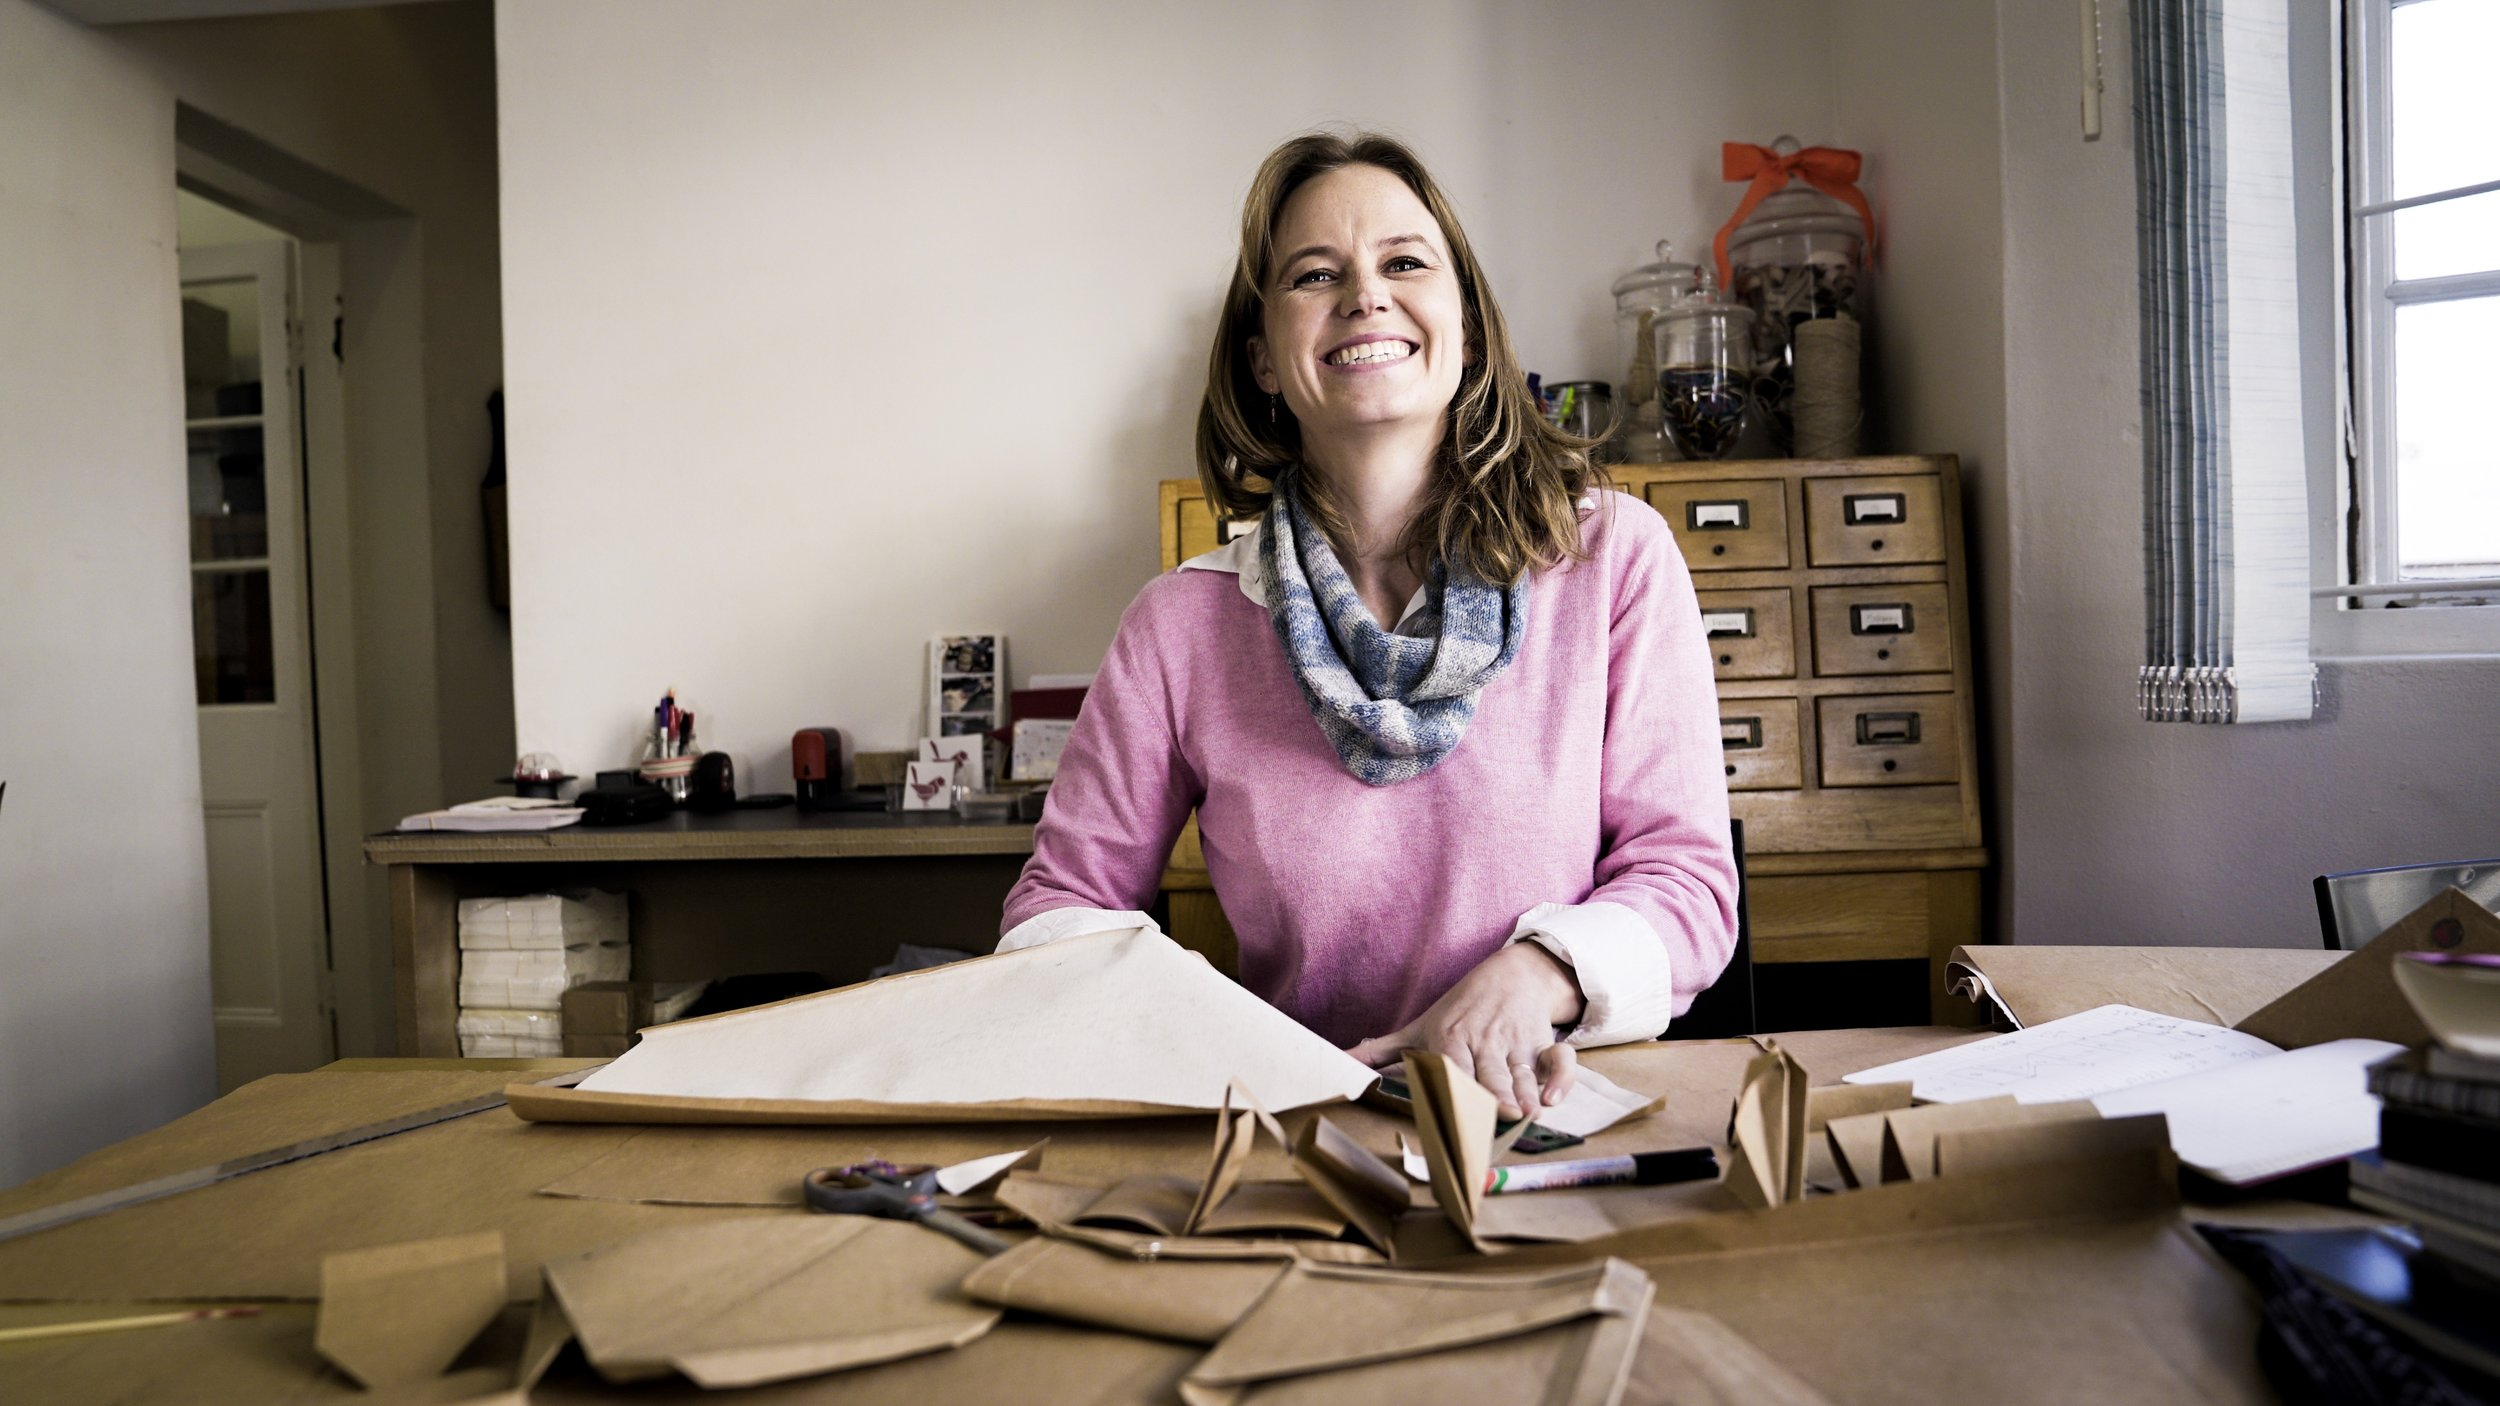 wendren setzer the wren design entrepreneur justyna kedra success founder werule we rule